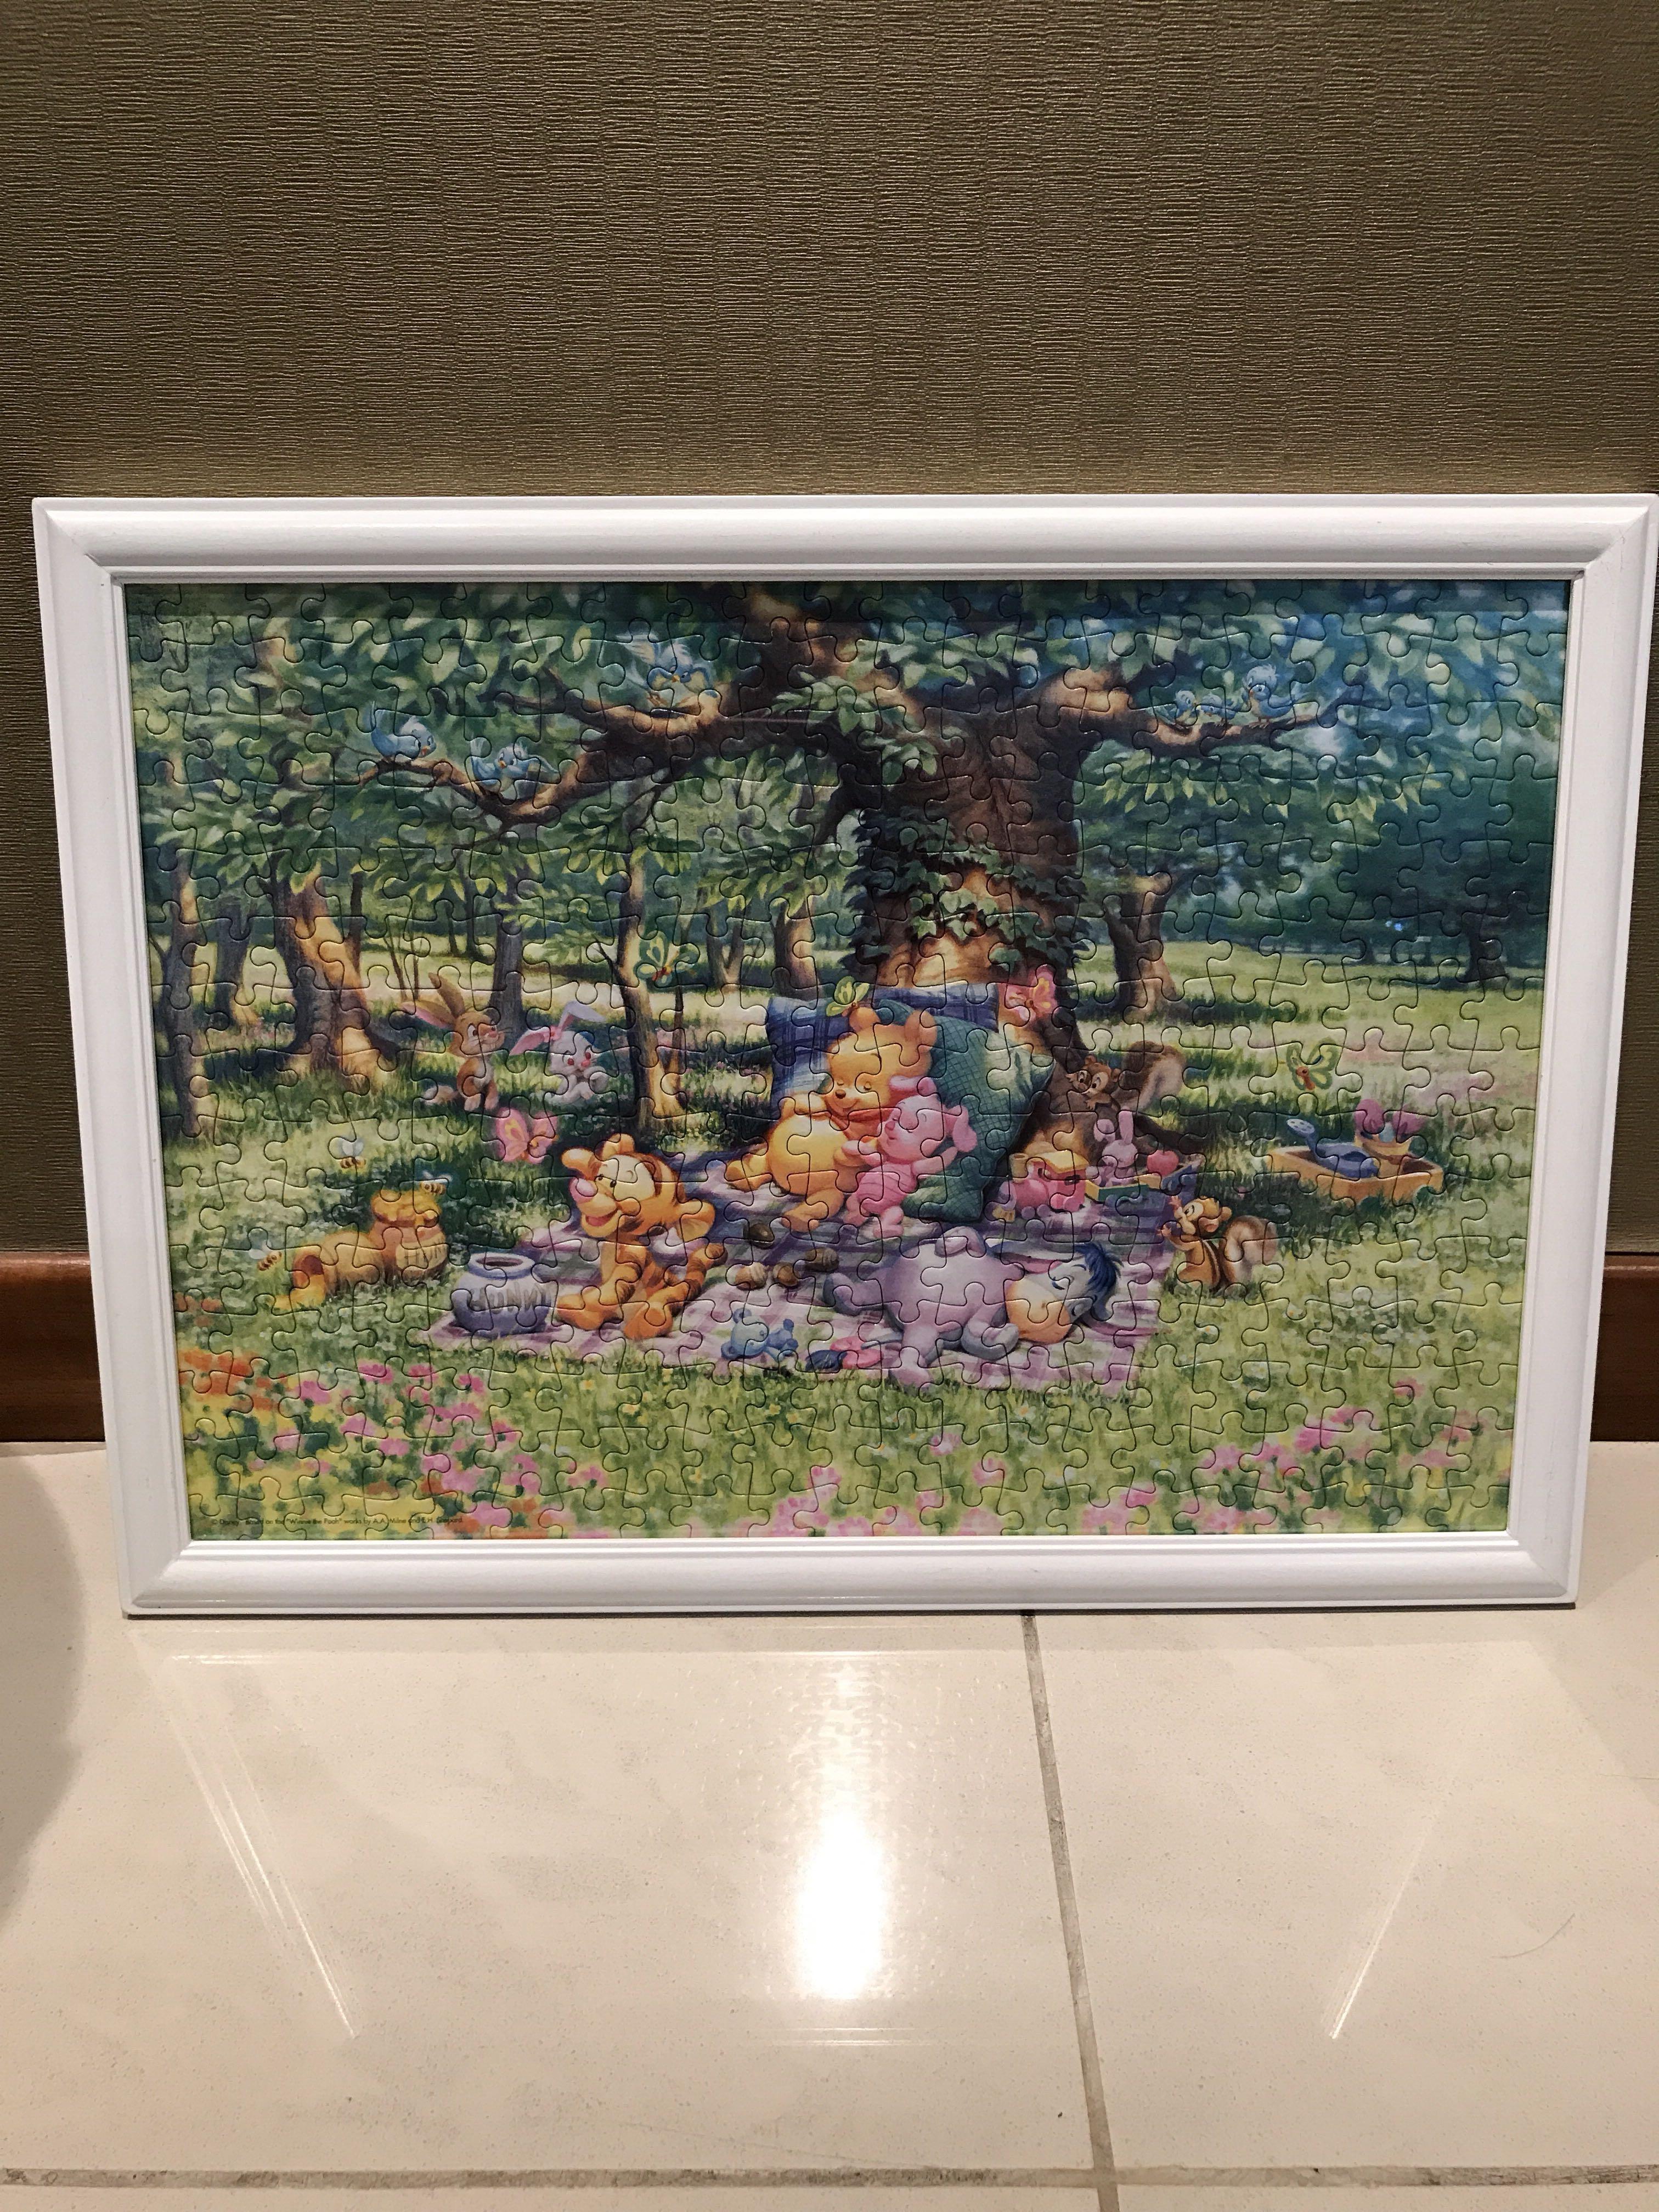 Disney Winnie The Pooh Jigsaw Puzzle, Design & Craft, Art & Prints - Print Jigsaw Puzzle Singapore